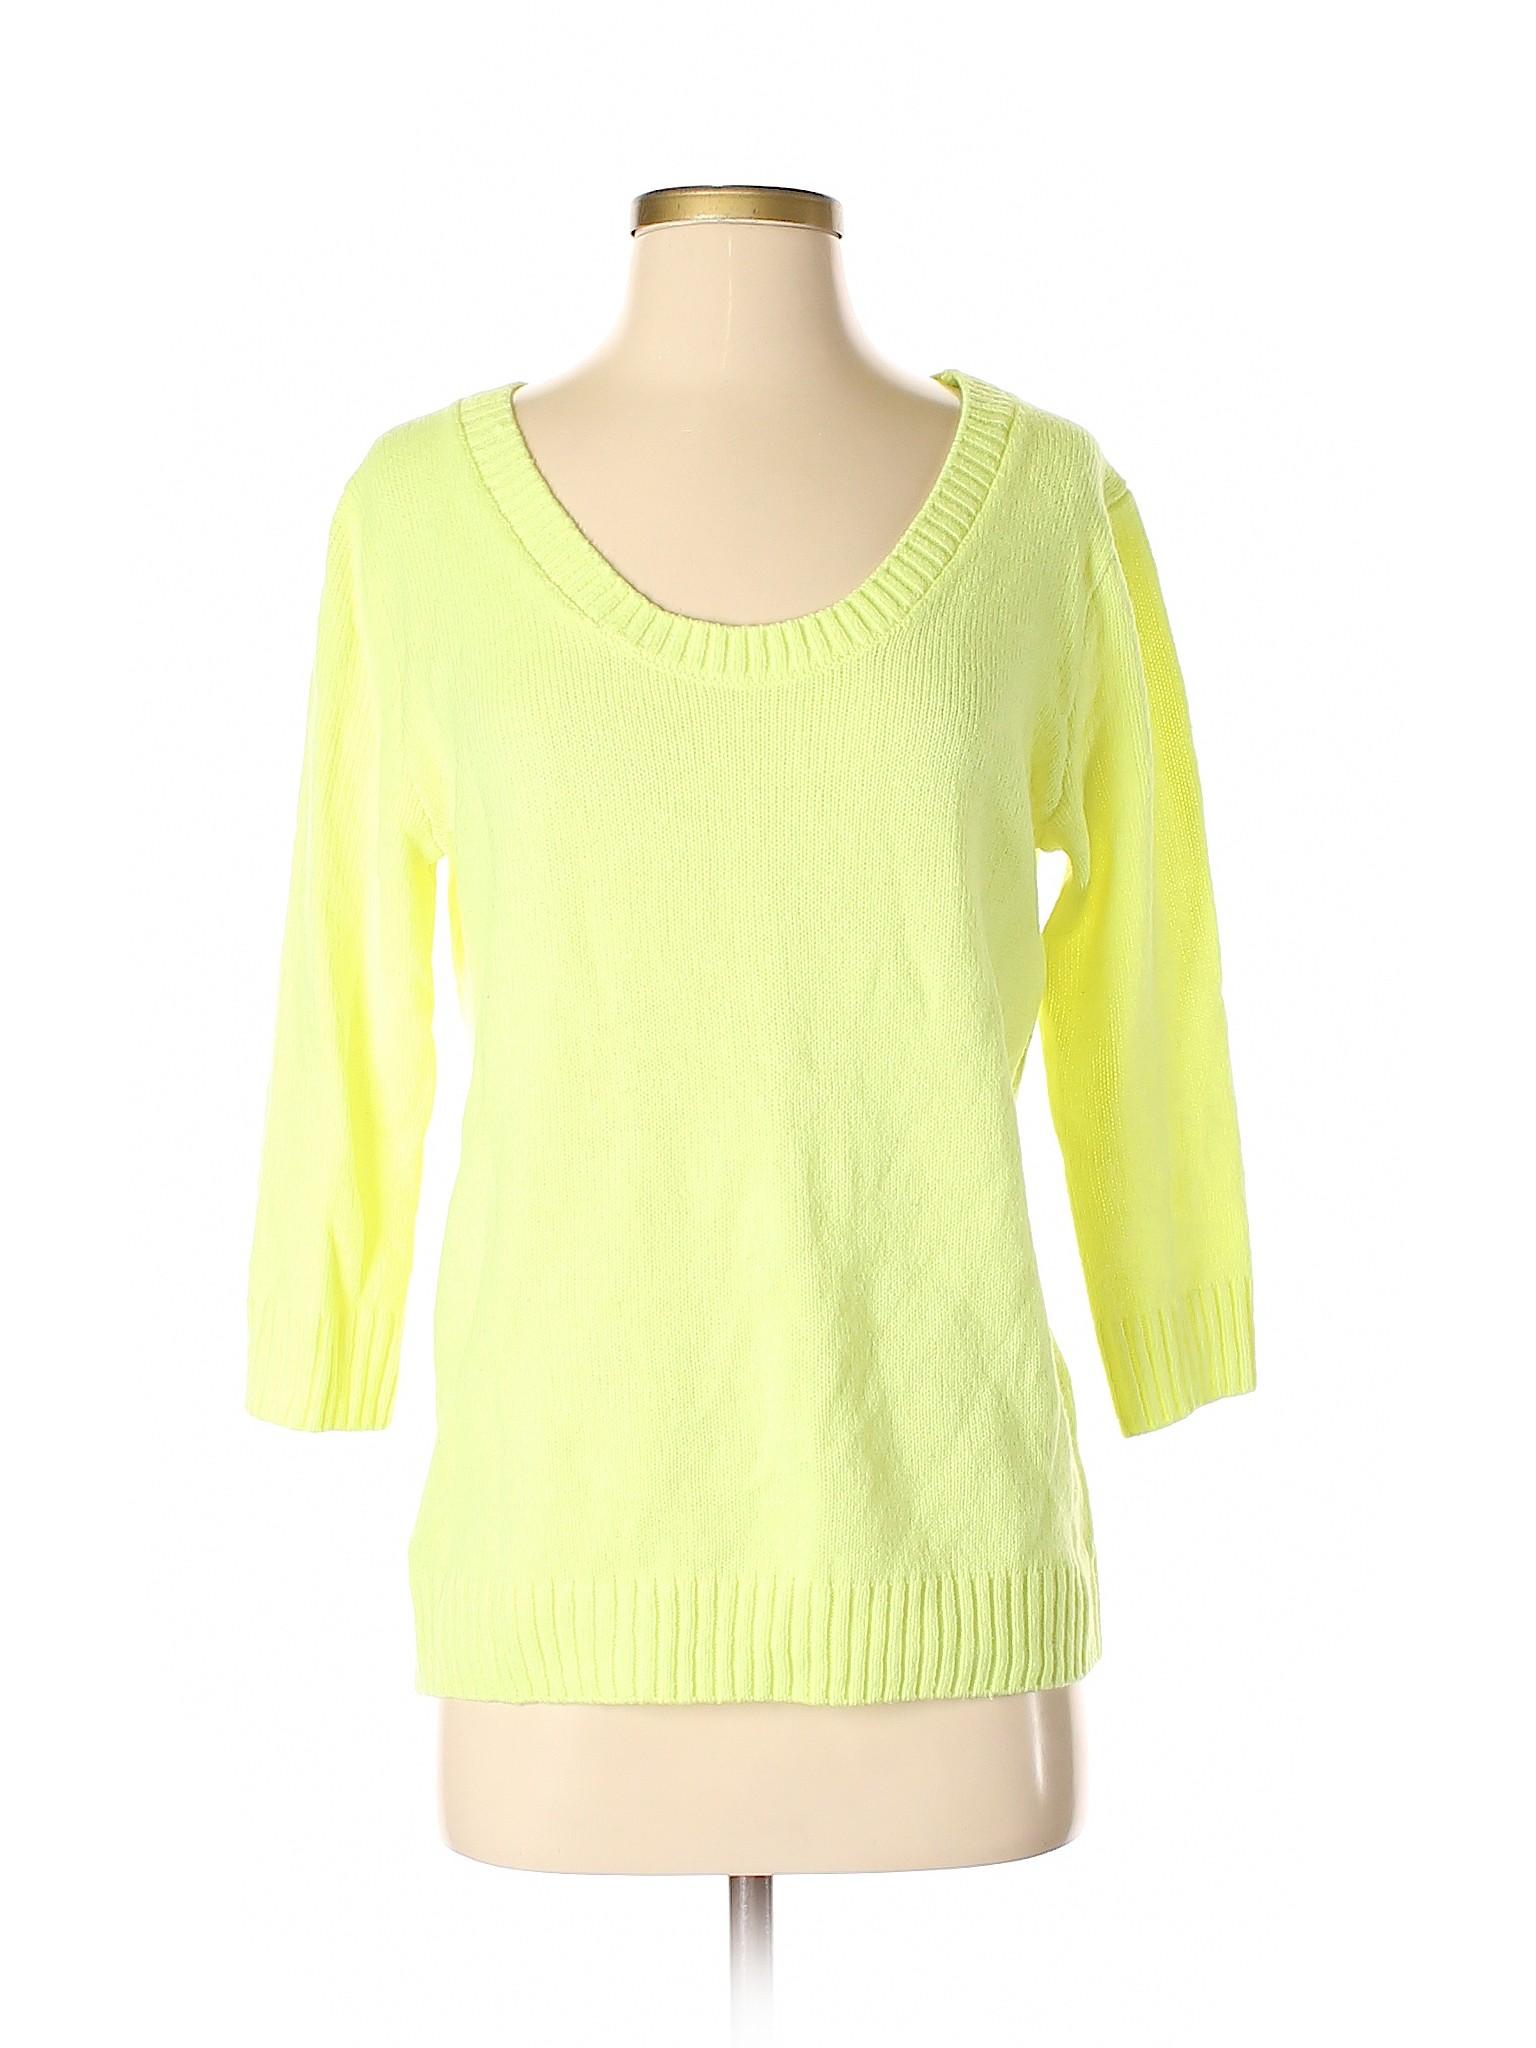 Pullover Boutique winter Sweater Boutique winter Gap P7FqYT